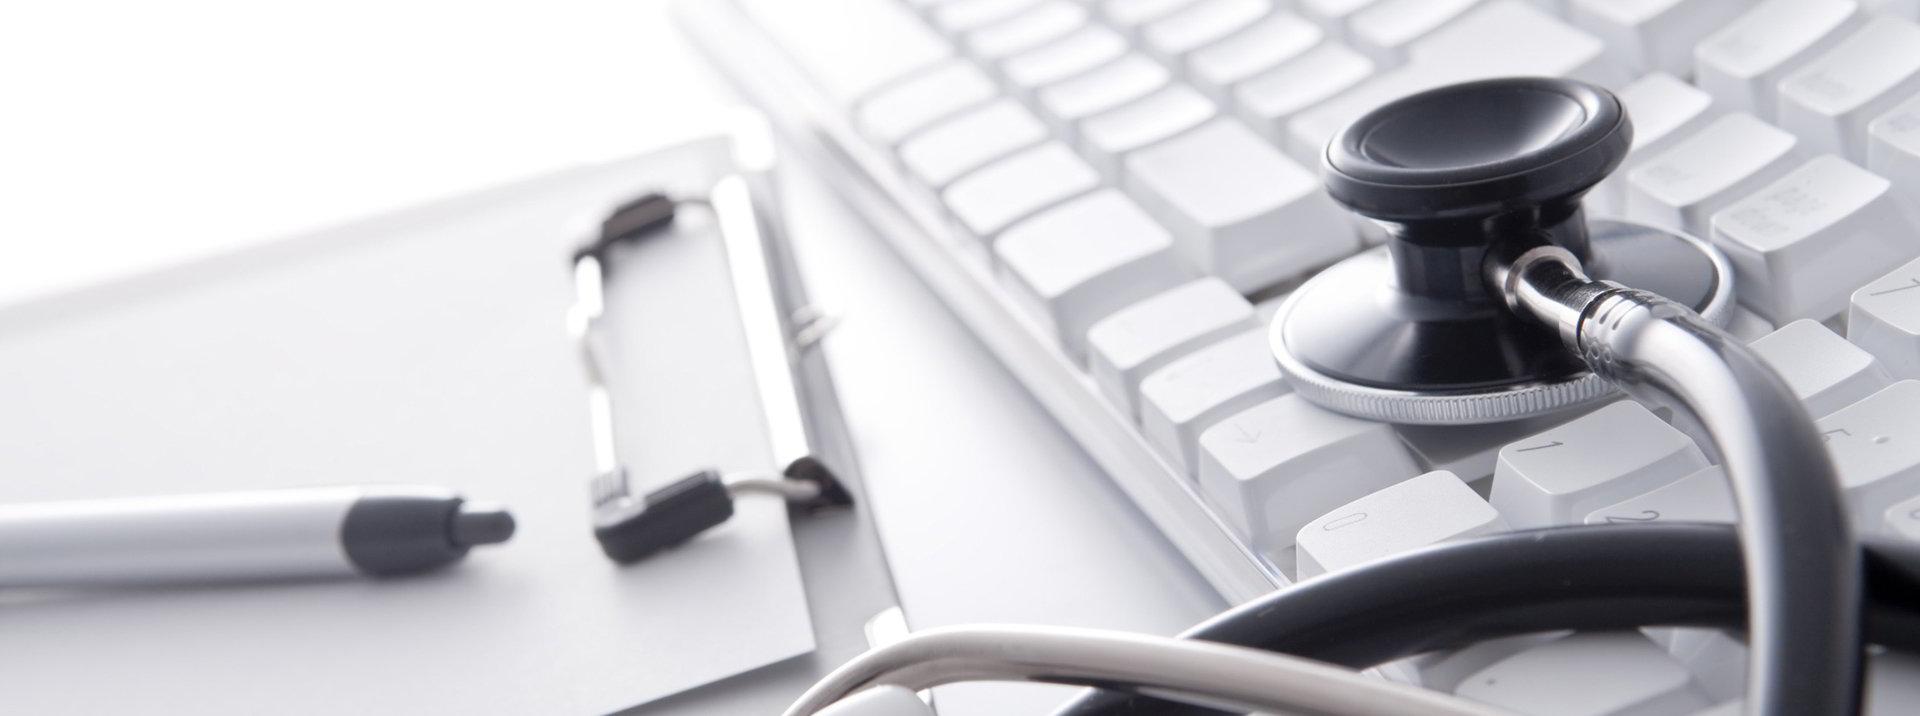 stethoscope-keyboard